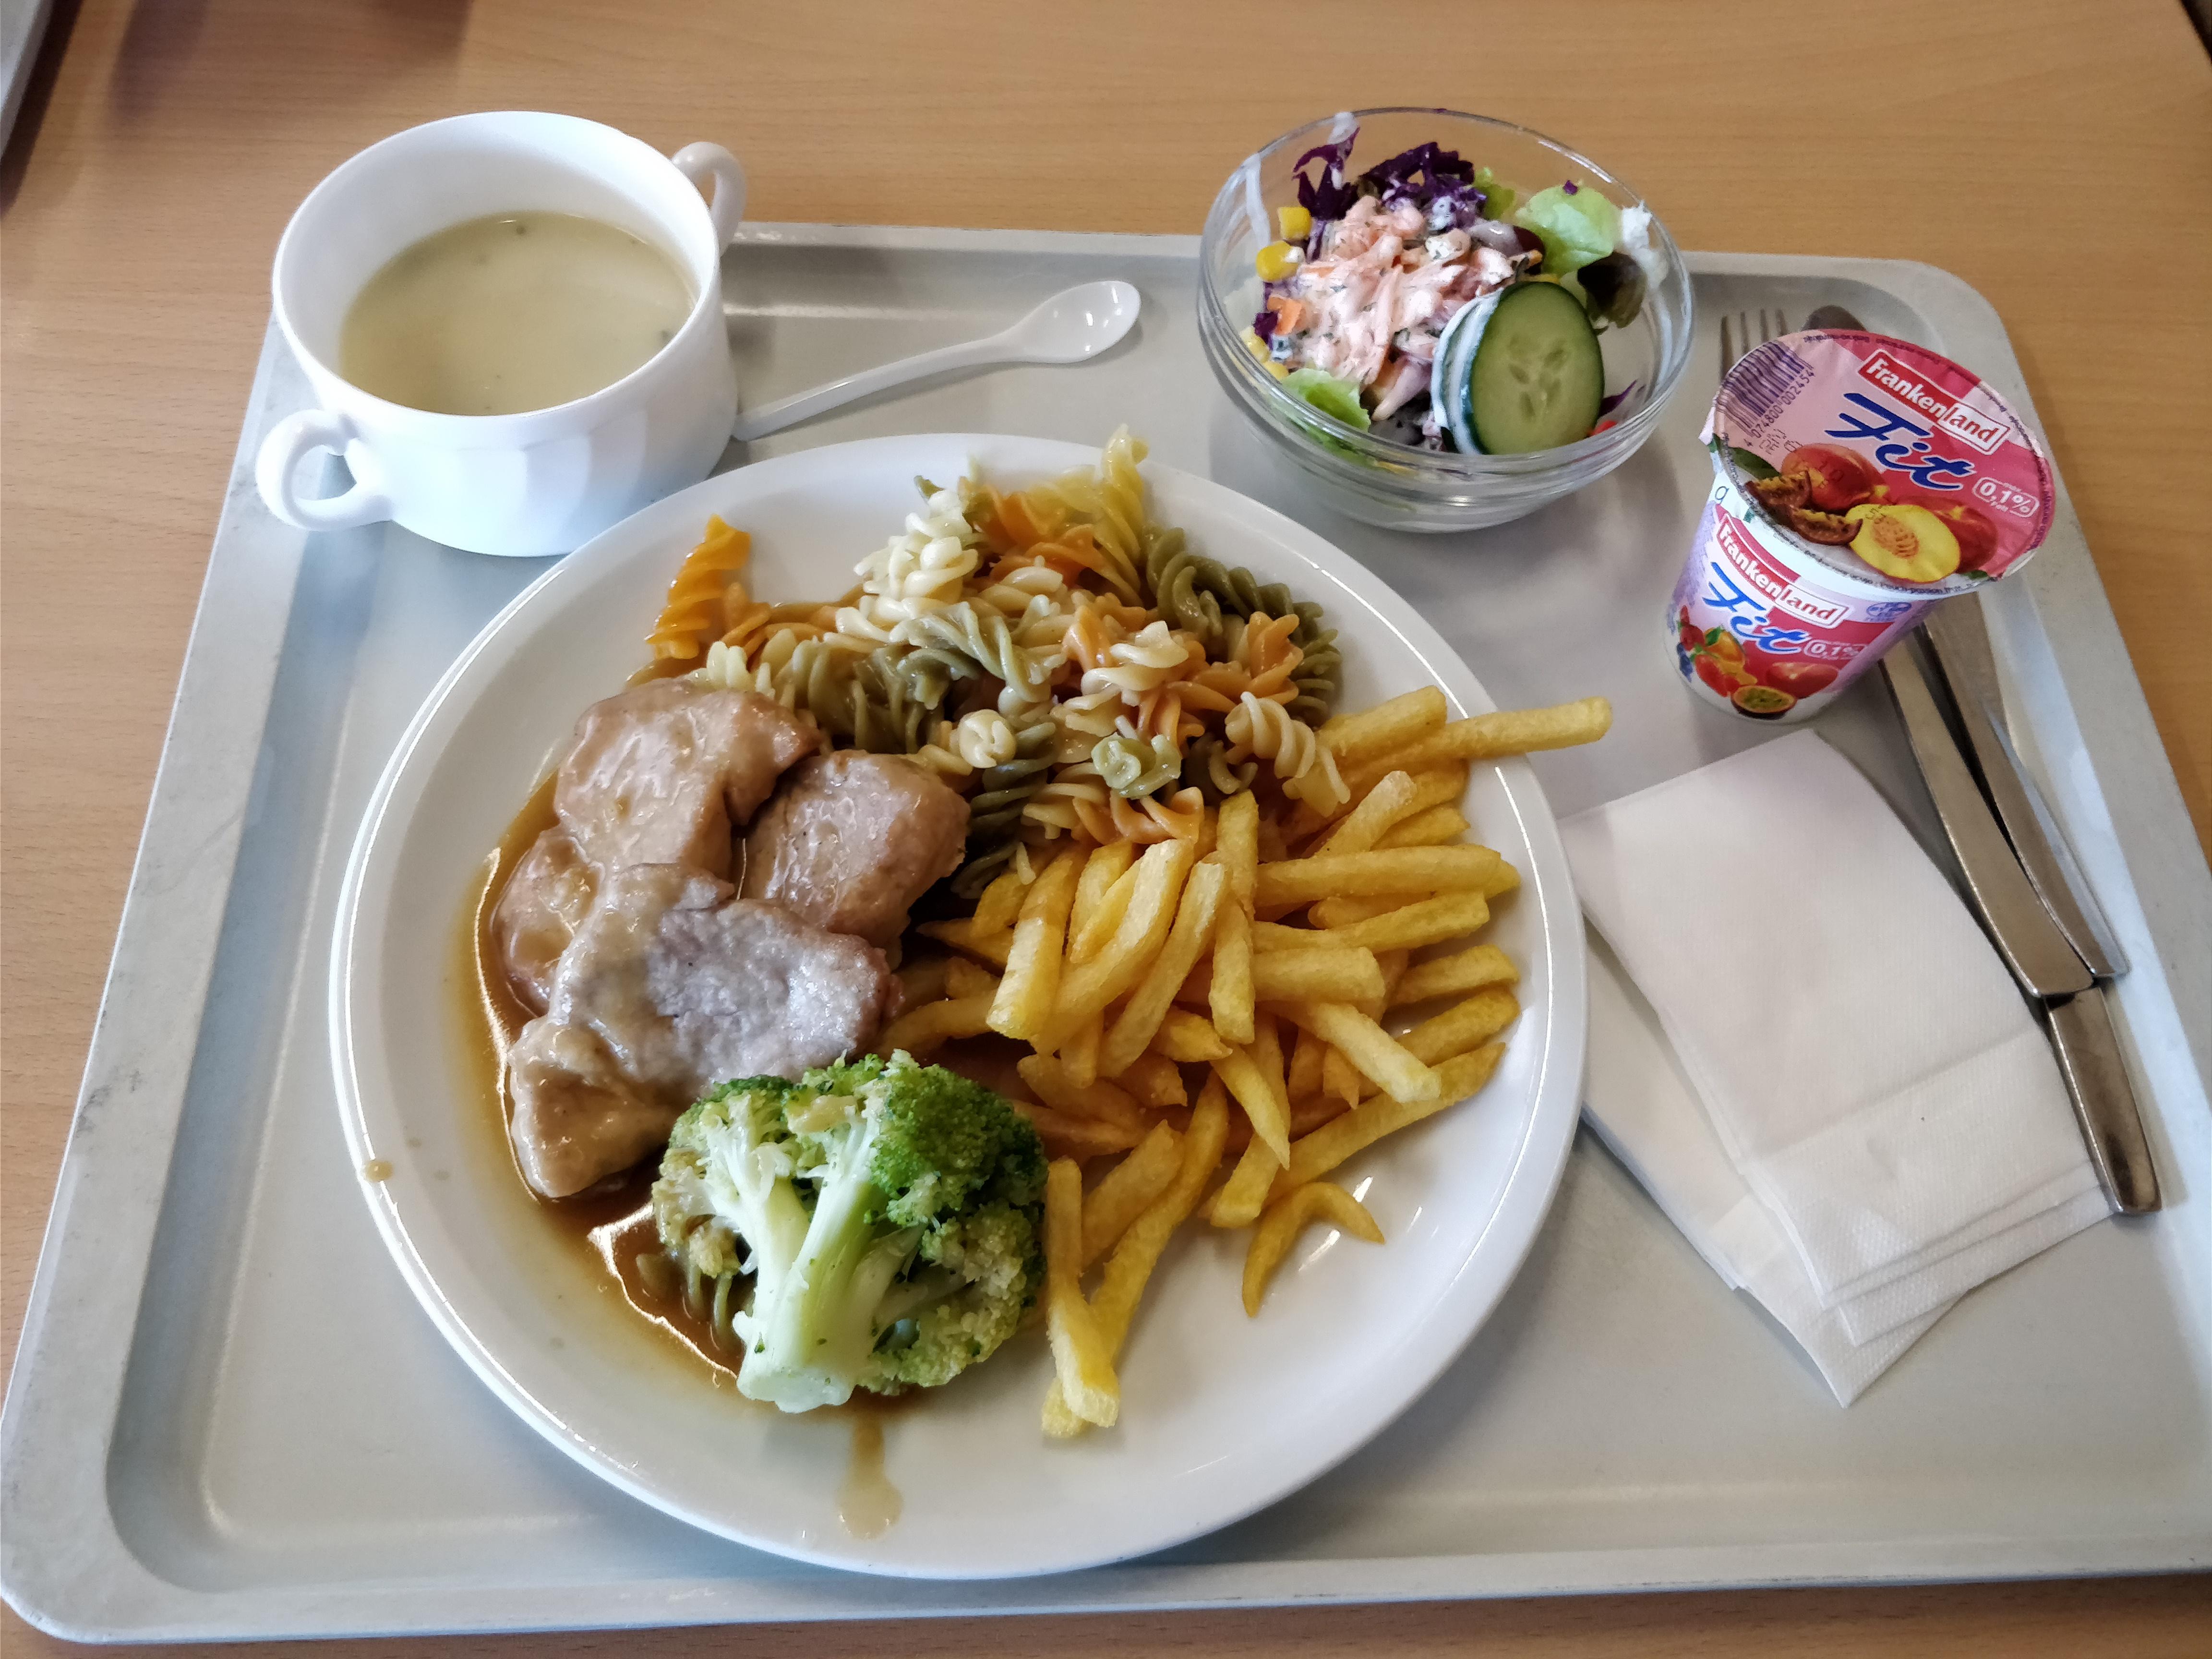 http://foodloader.net/nico_2017-09-21_schweinelendchen-nudeln-pommes-brokkoli-suppe-salat-joghurt.jpg